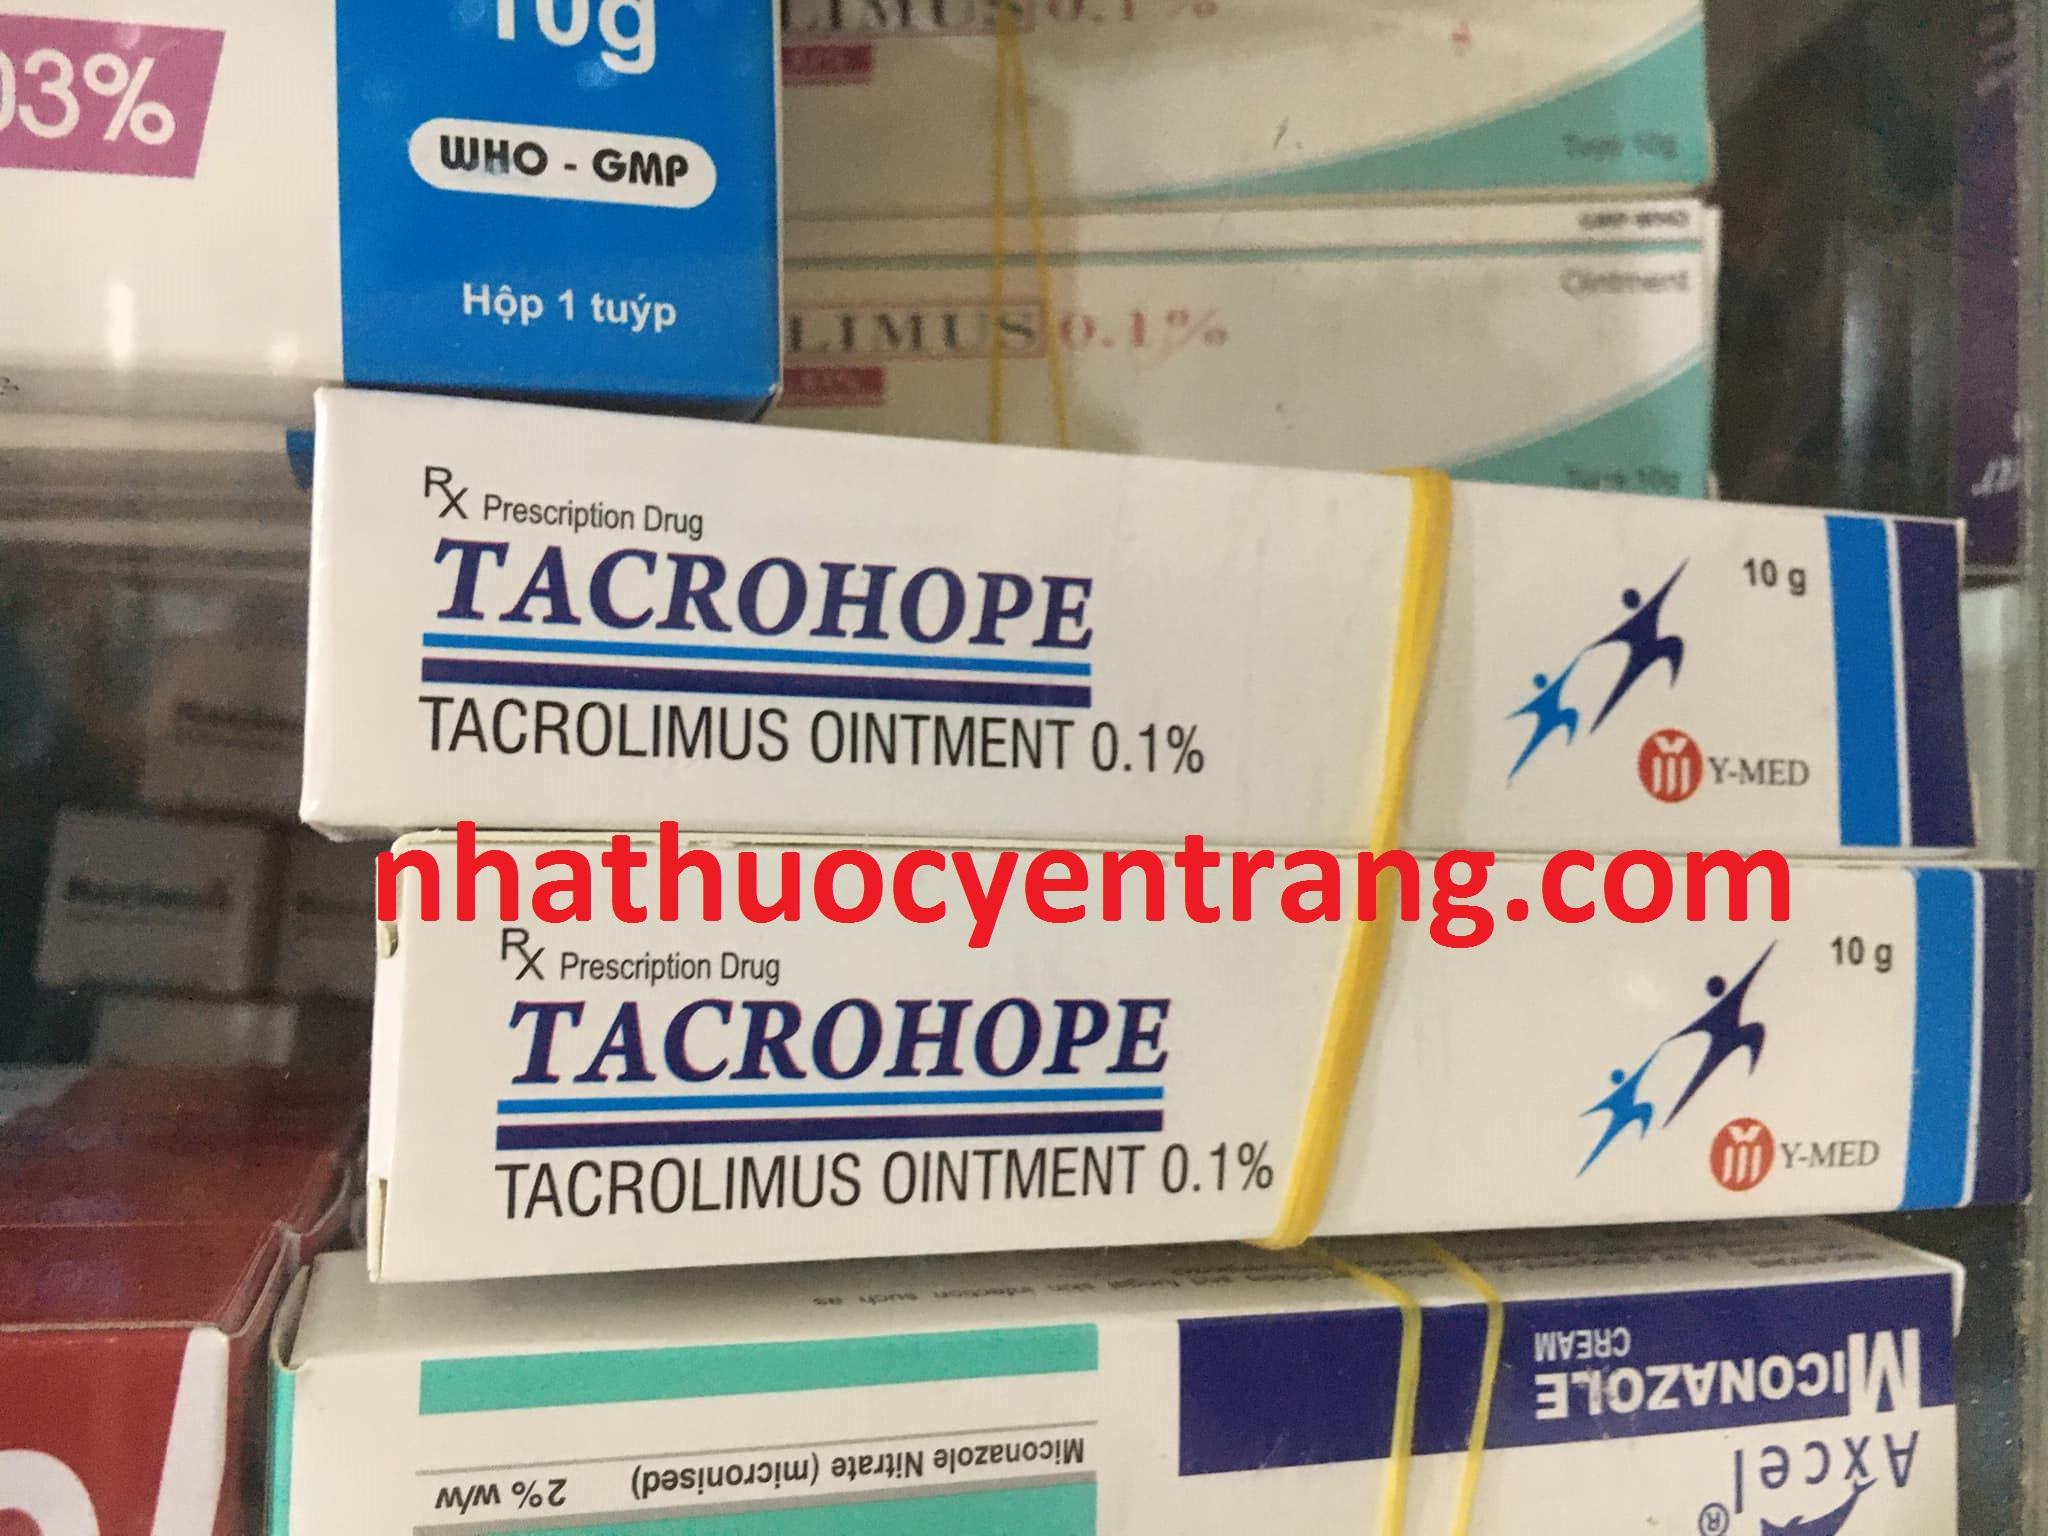 Tacrohope 0.1%